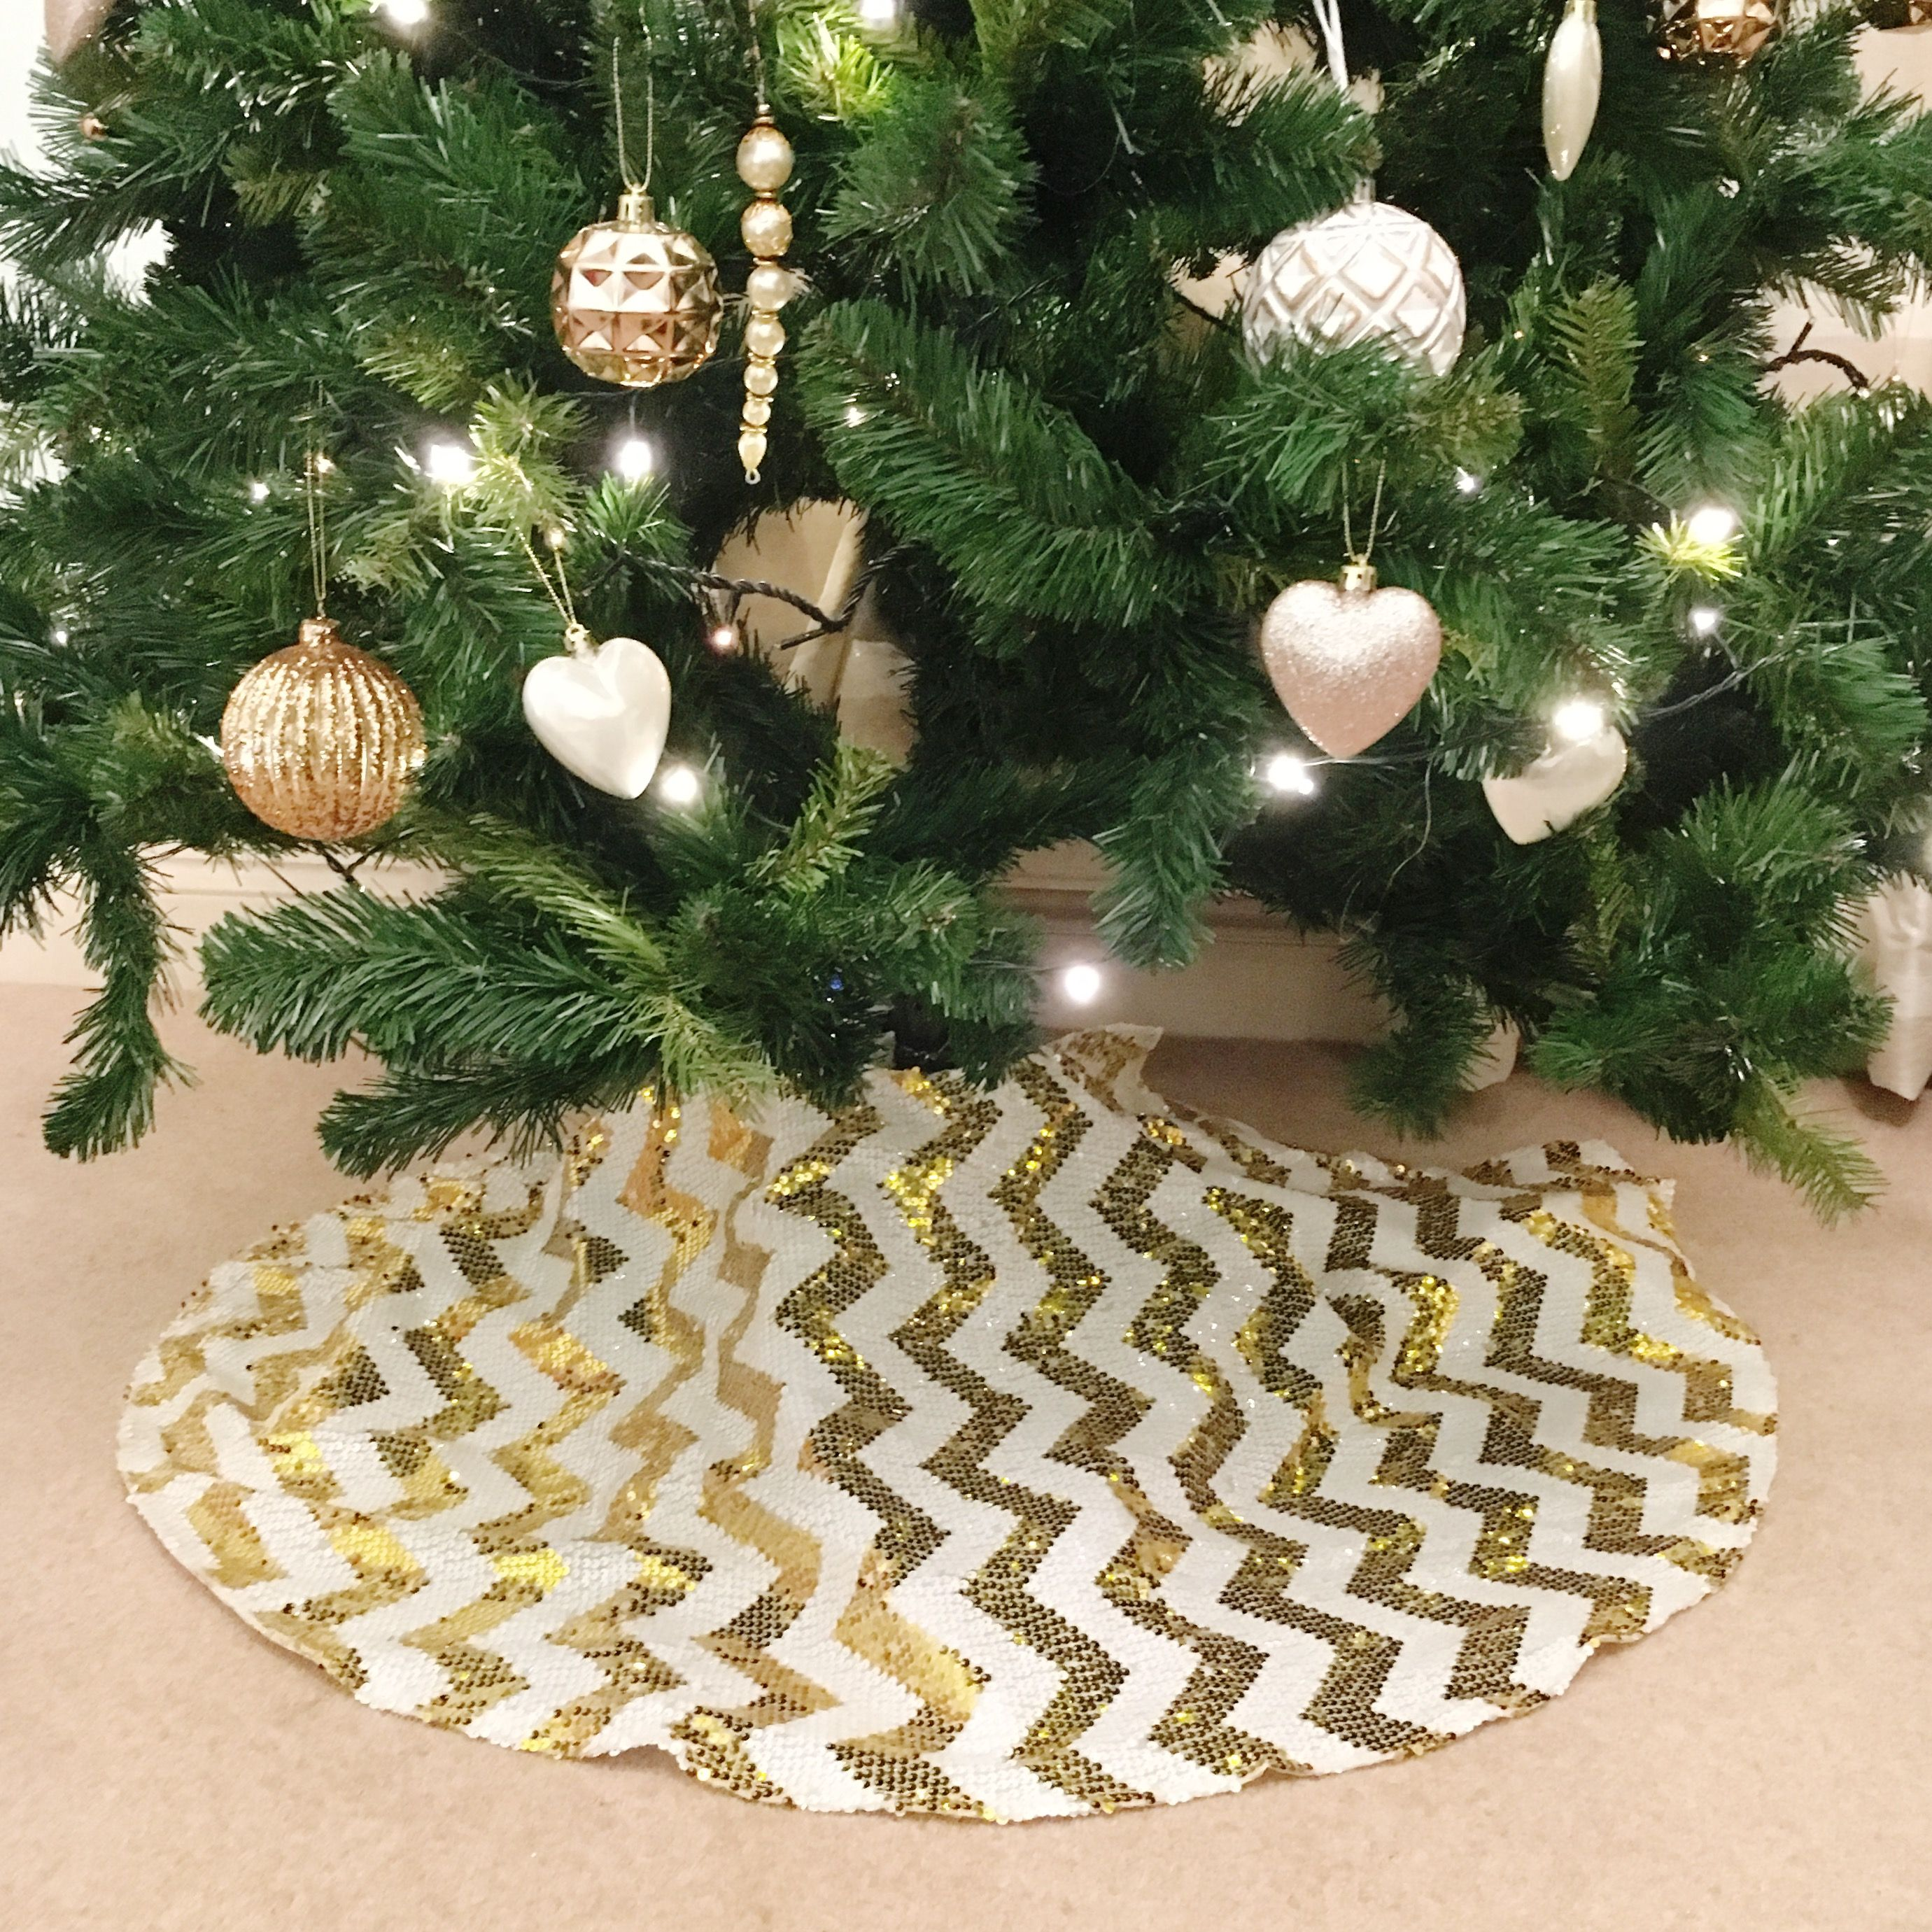 Best Christmas Tree Skirts Wicker Gold Silver Faux Fur